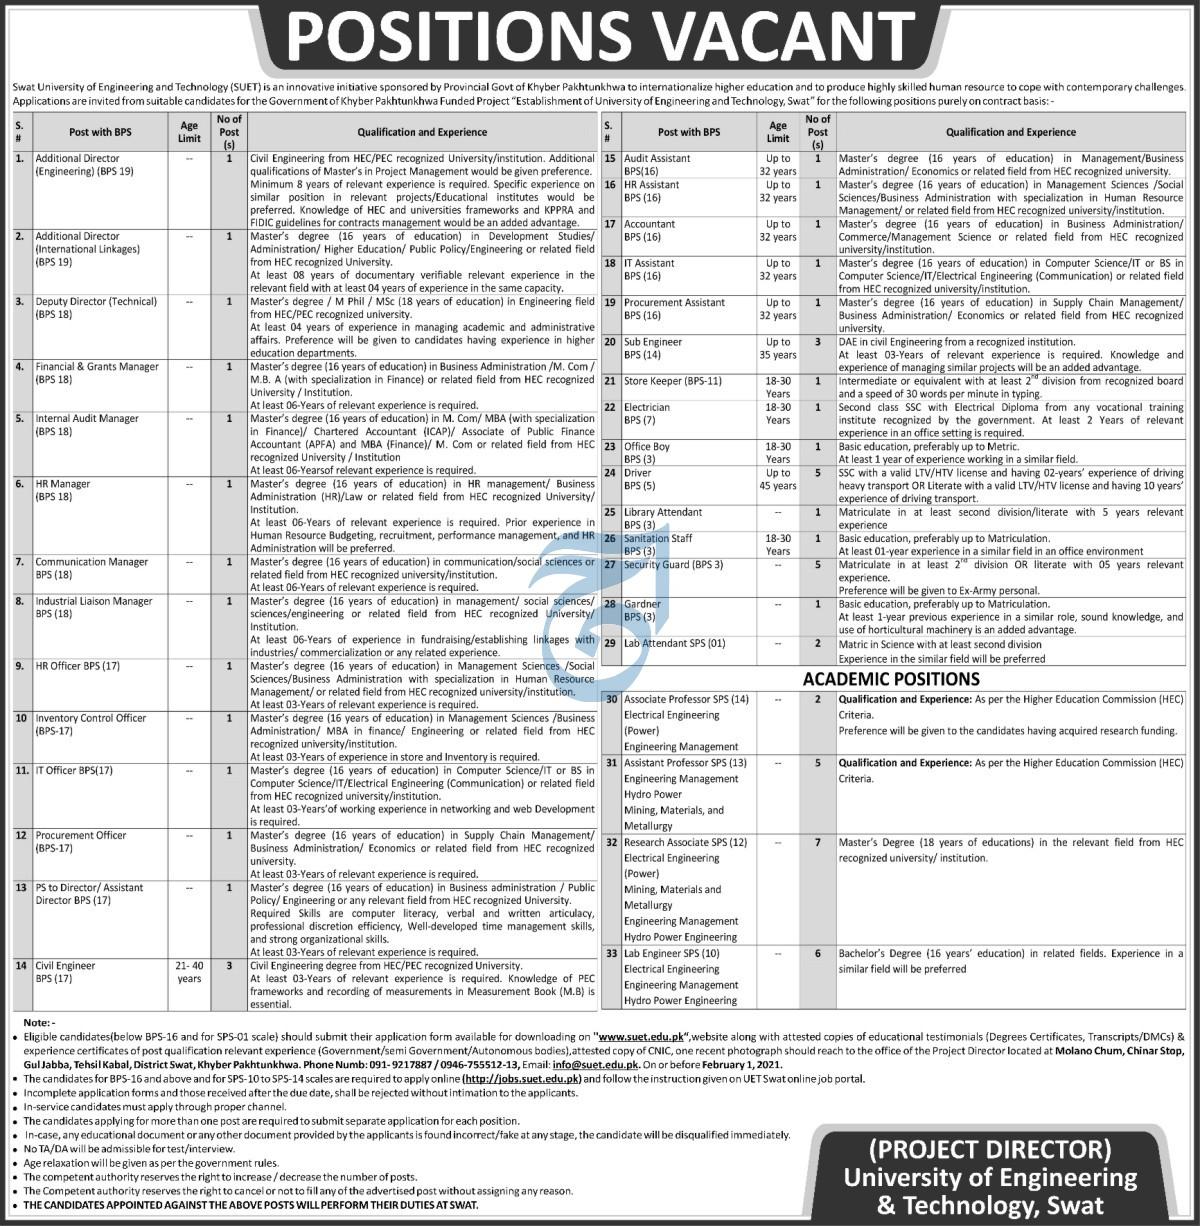 SUET University of Engineering Technology Swat Jobs